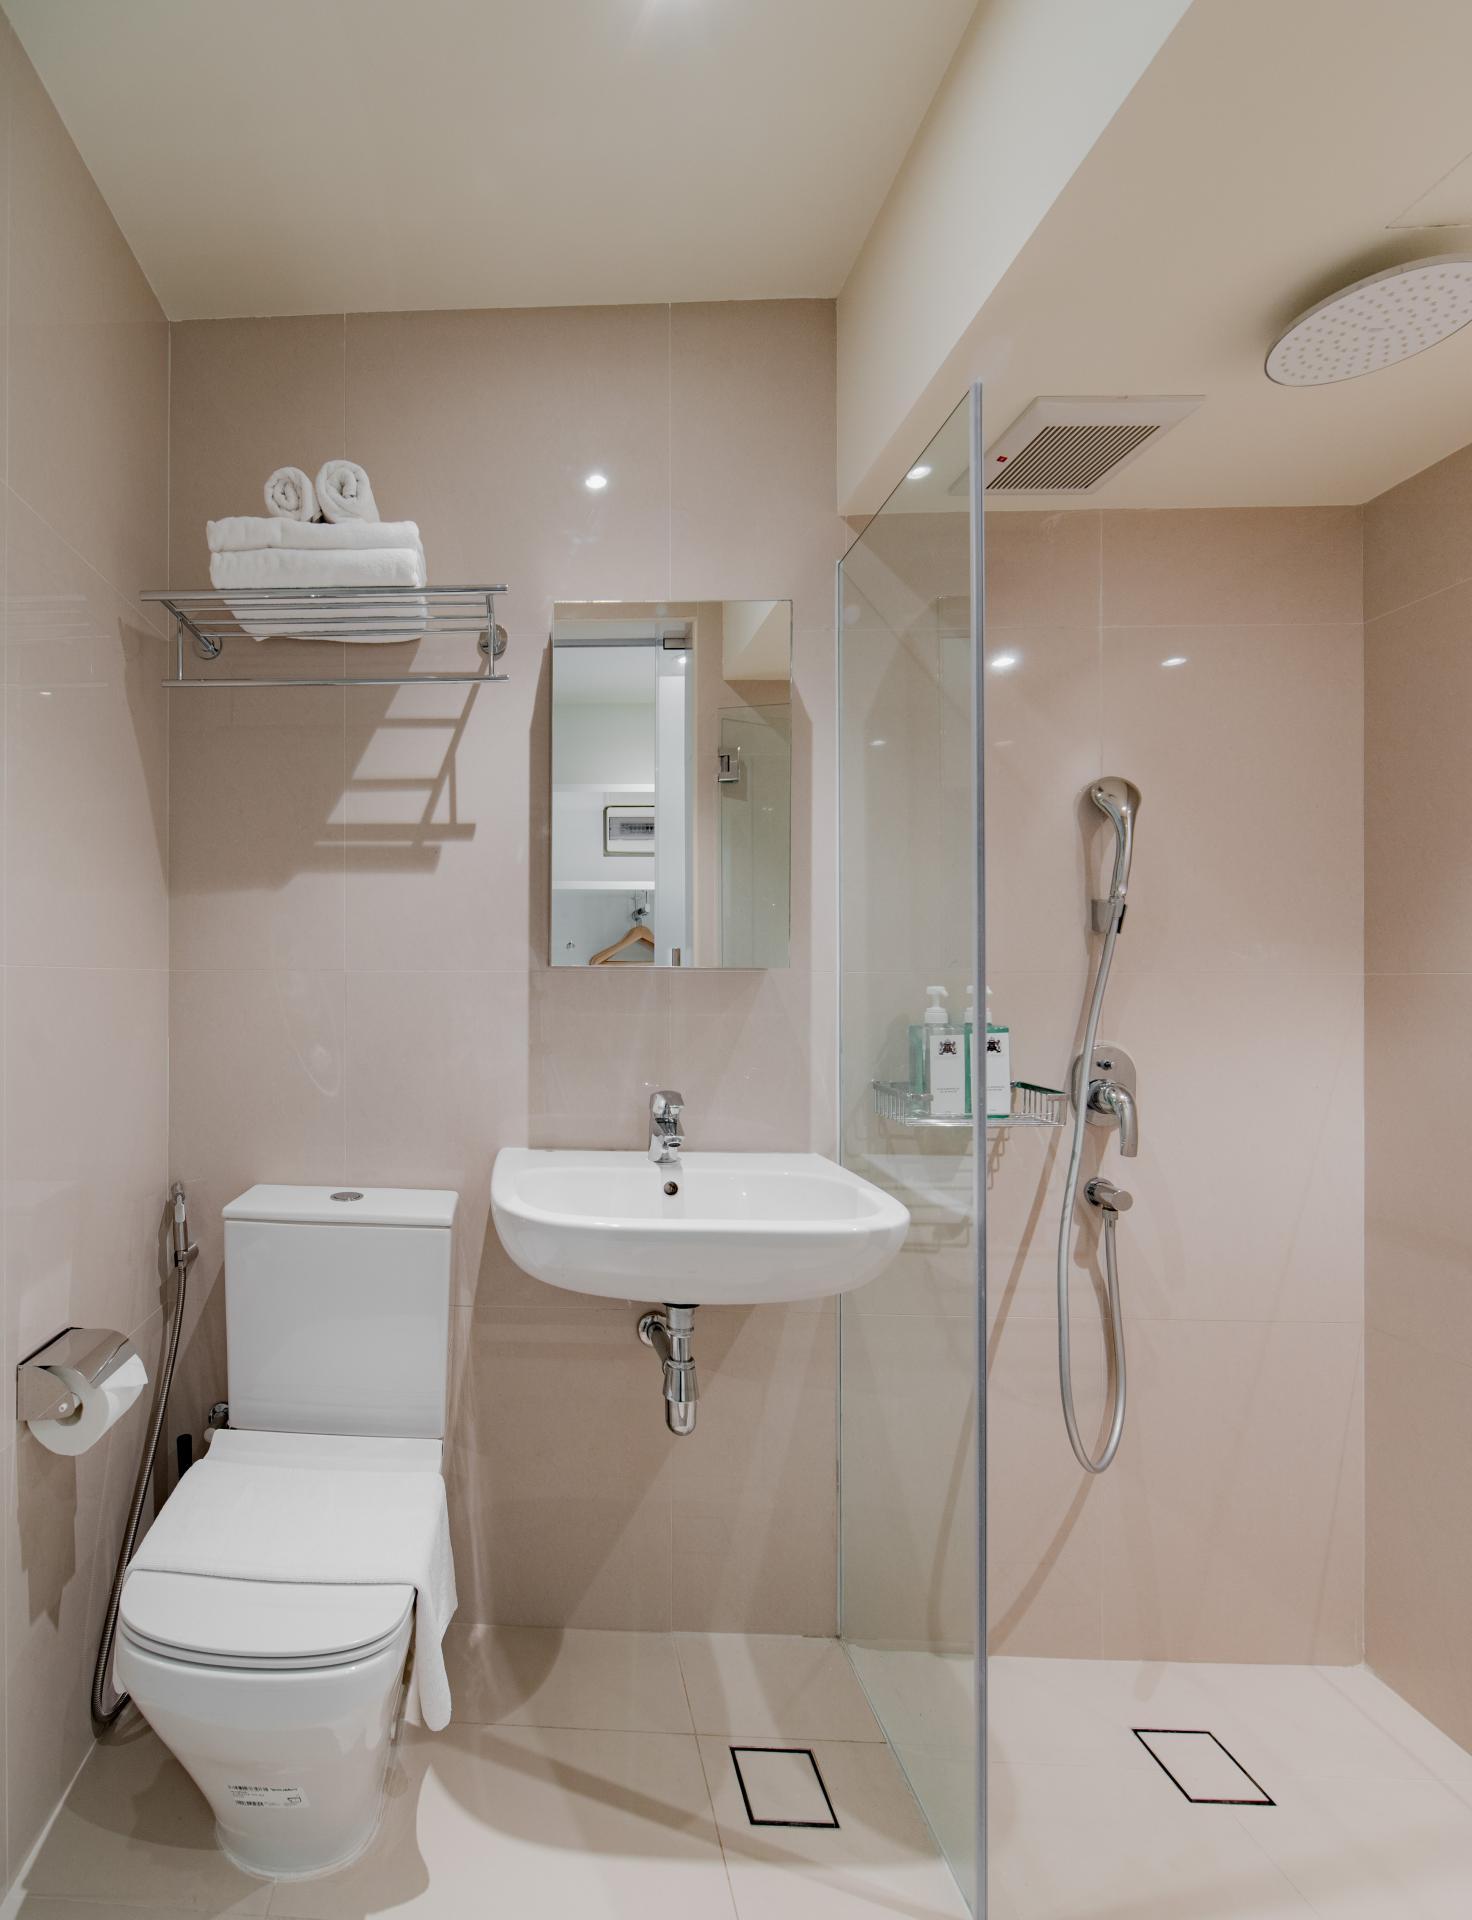 Bathroom at Smith Street Apartments, Singapore